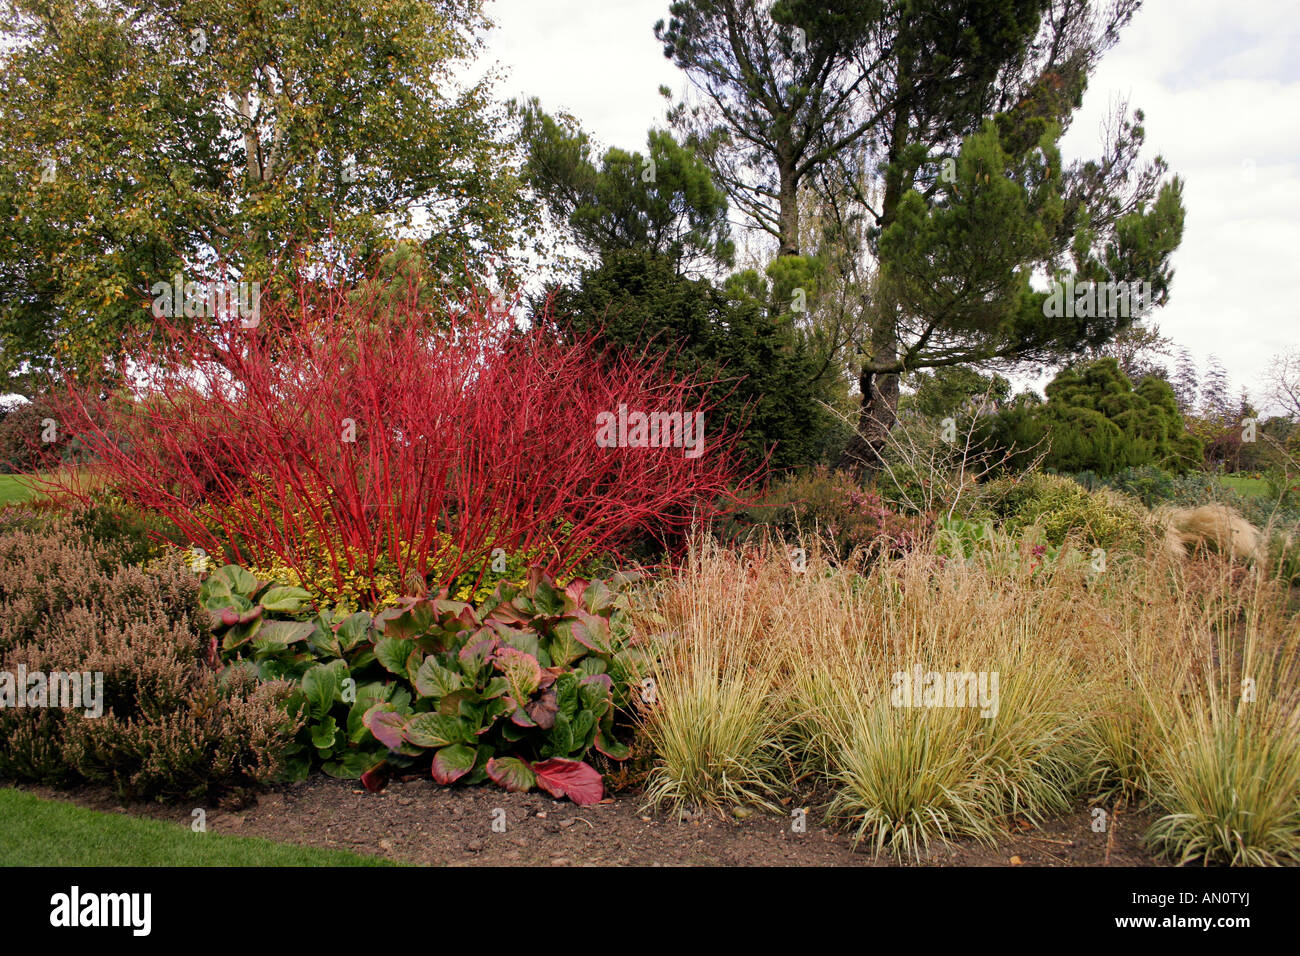 cornus alba sibirica dogwood in autumn stock photo 15374789 alamy. Black Bedroom Furniture Sets. Home Design Ideas